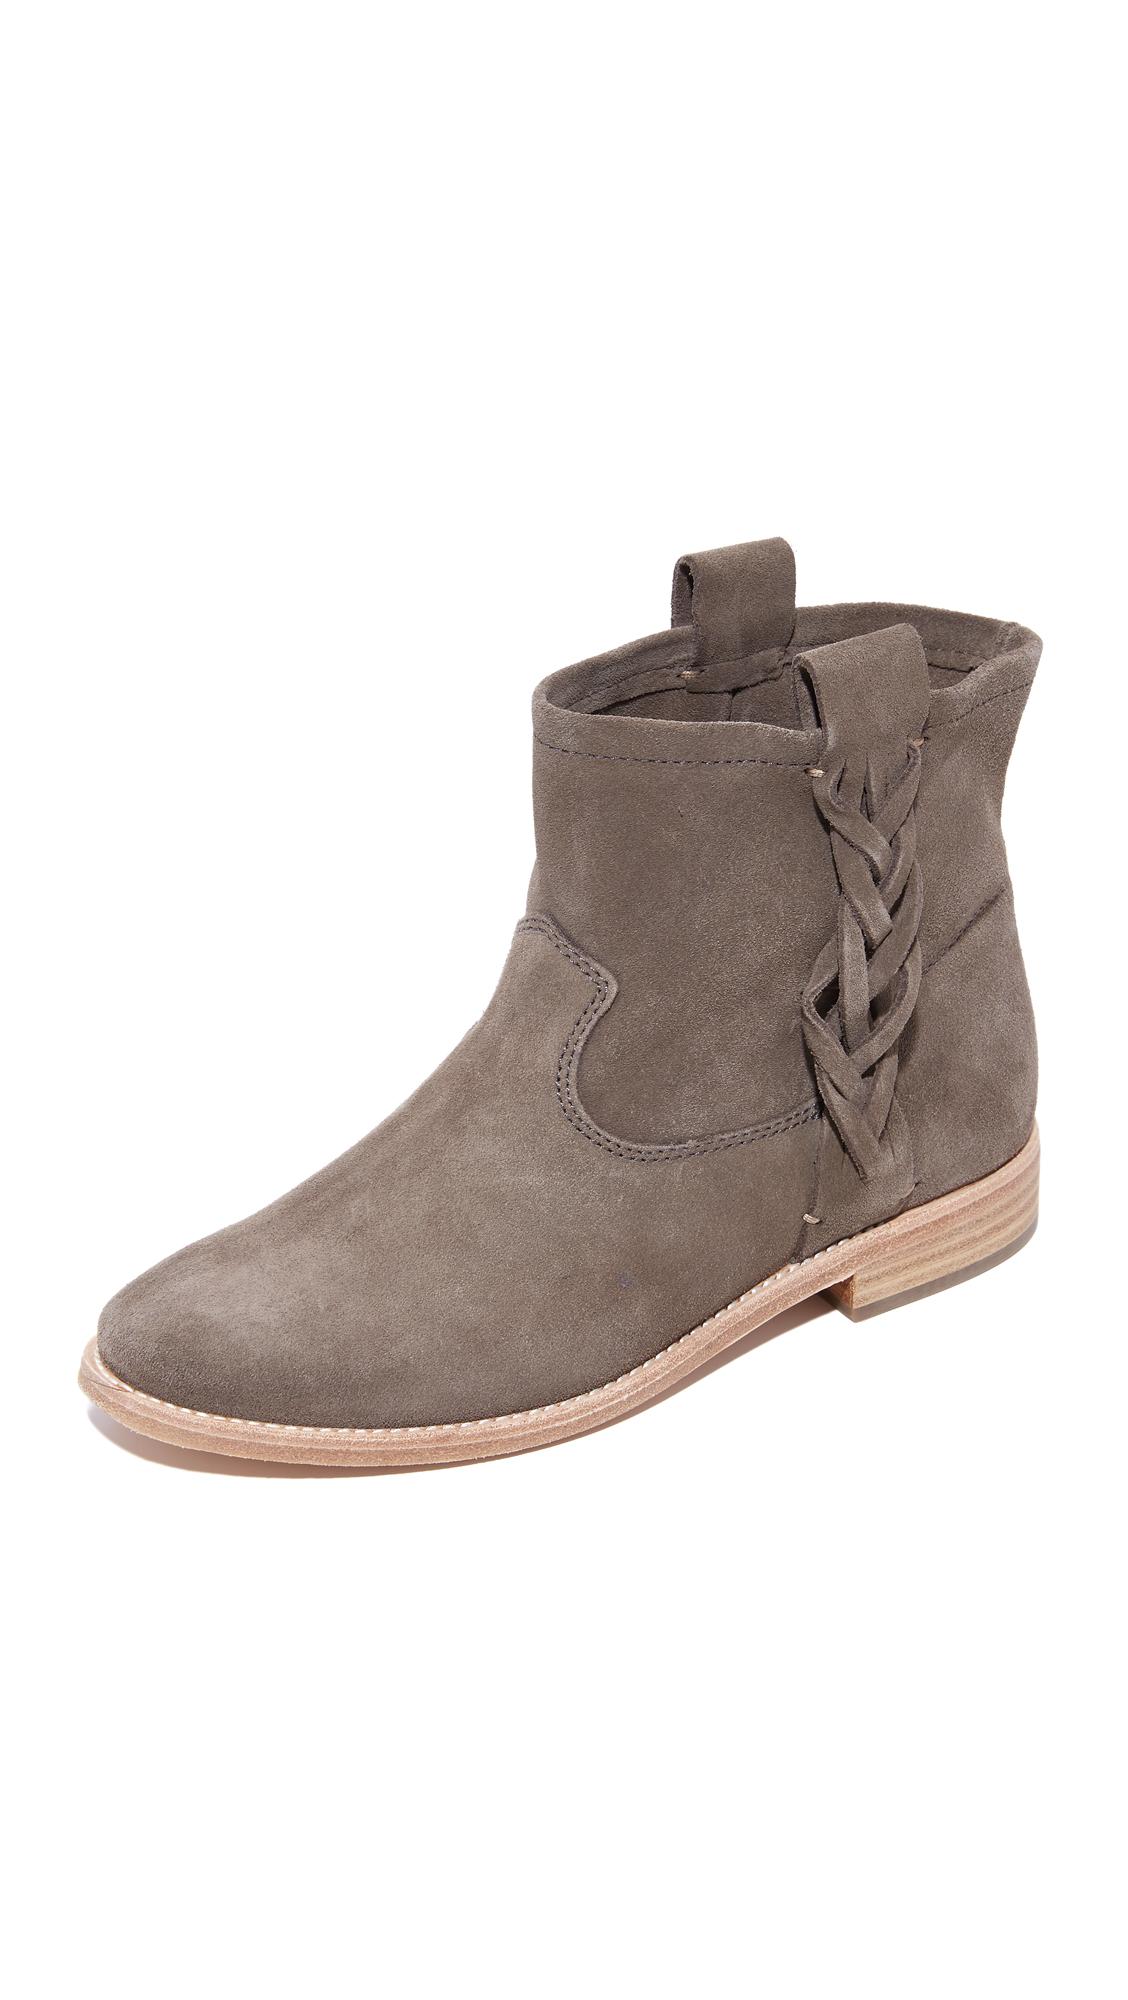 Soludos Flat Booties - Gray